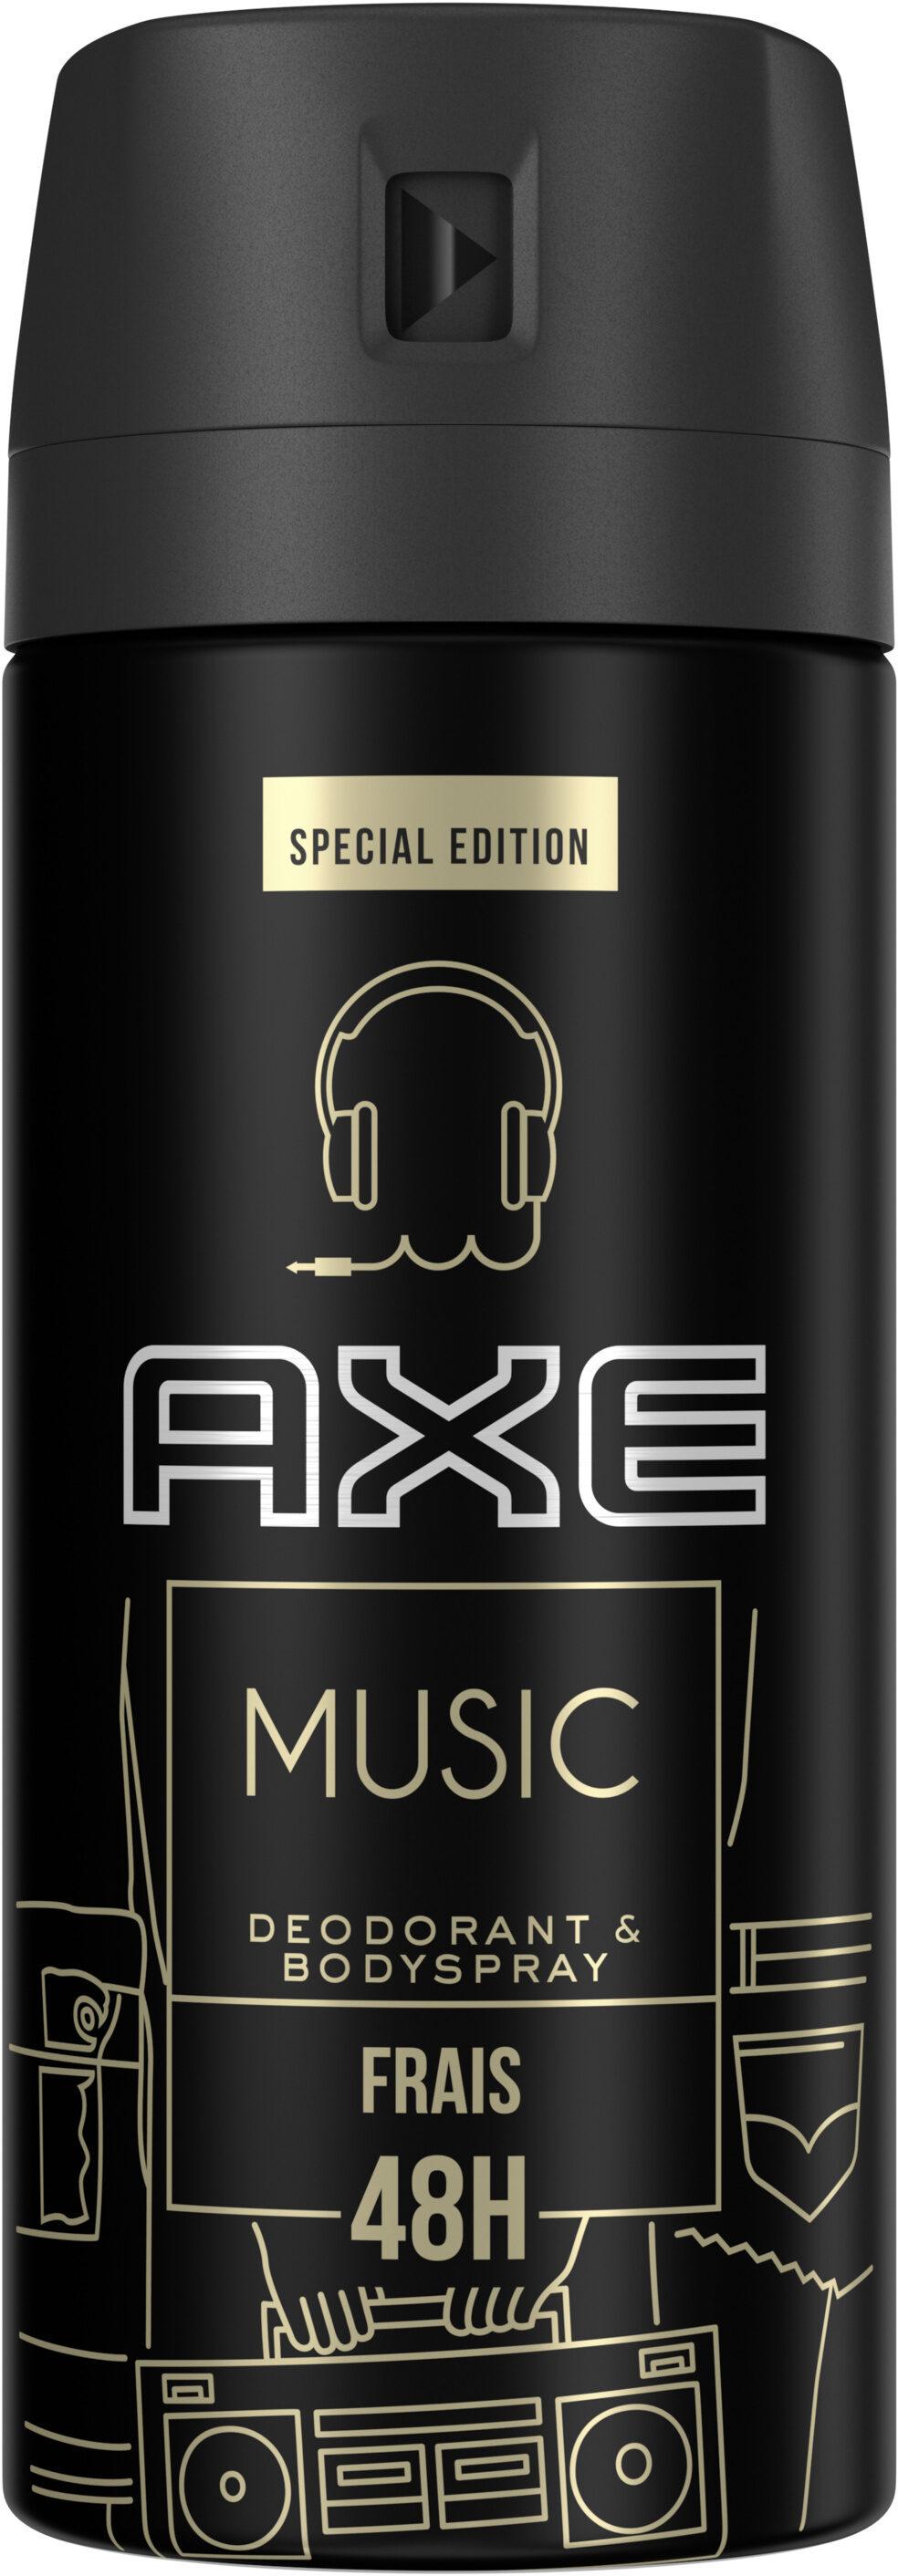 AXE Music Déodorant Homme Spray Antibactérien All Day Fresh - Продукт - fr